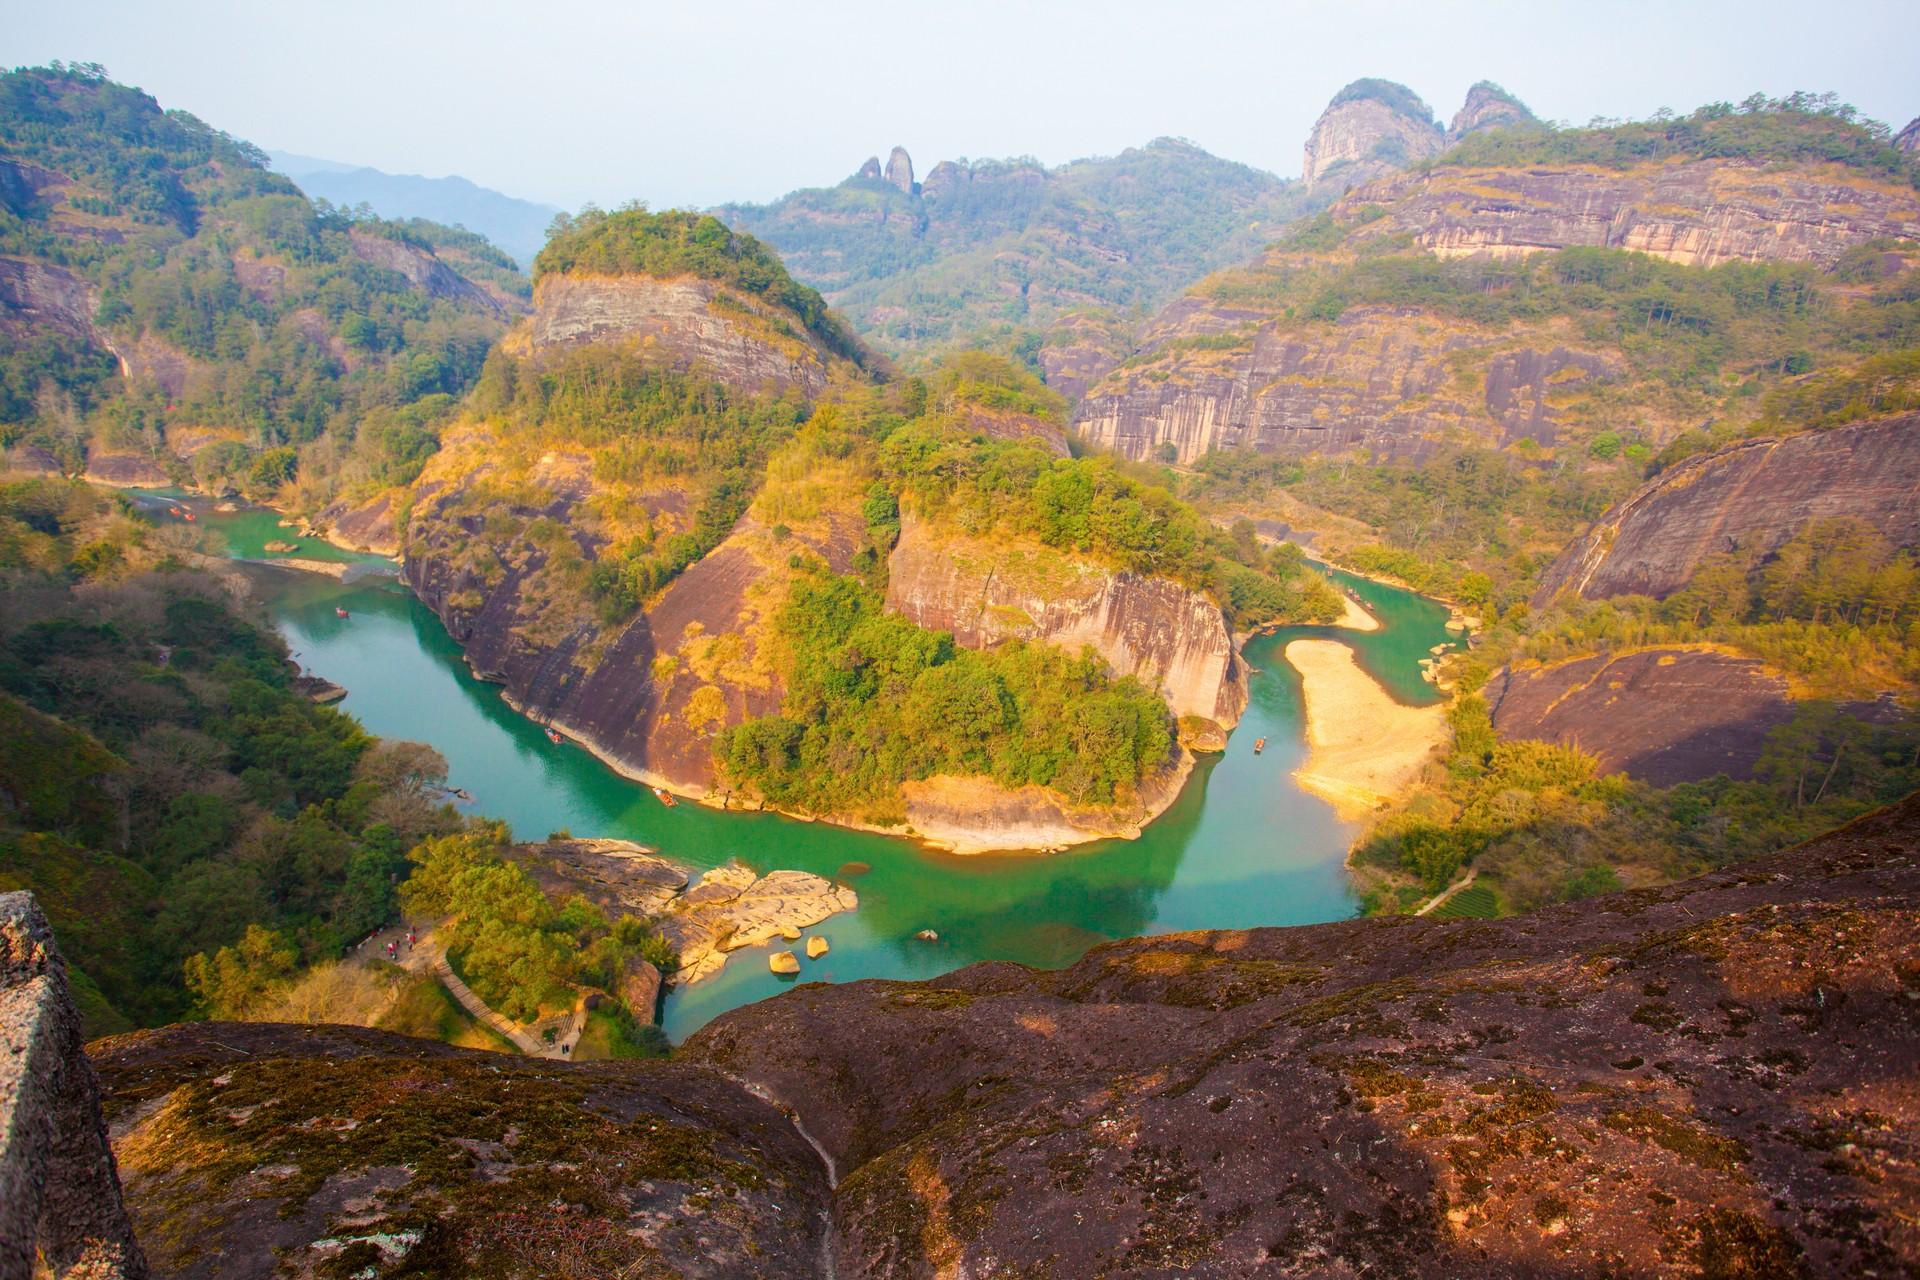 Top 10 scenic journeys: Mount Wuyi